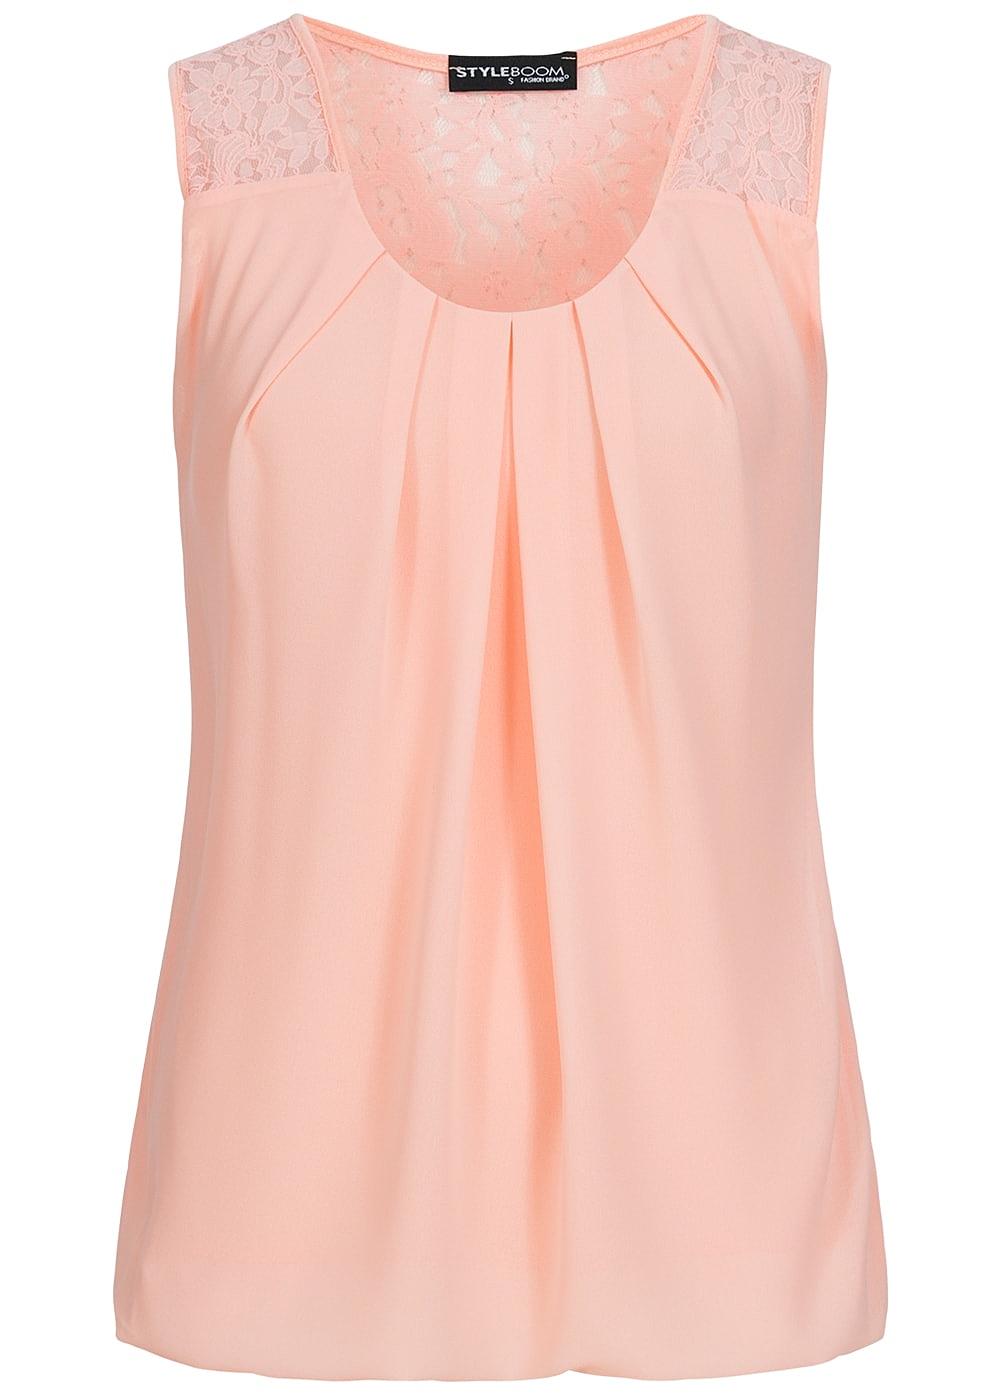 styleboom fashion damen chiffon top spitze unifarben rosa 77onlineshop. Black Bedroom Furniture Sets. Home Design Ideas